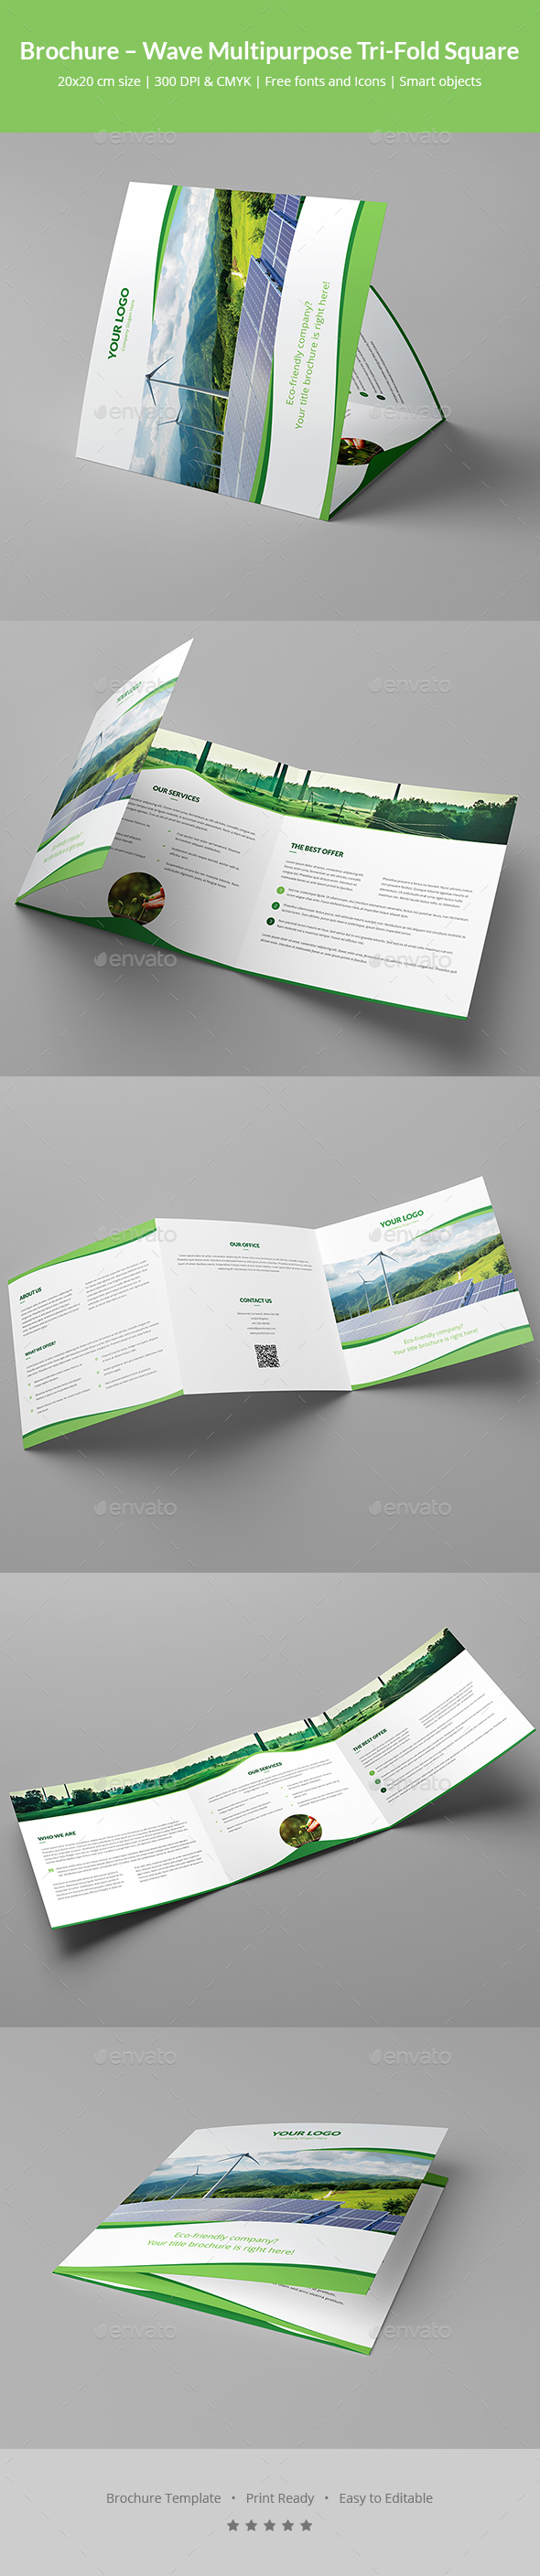 Brochure – Wave Multipurpose Tri-Fold Square - Corporate Brochures